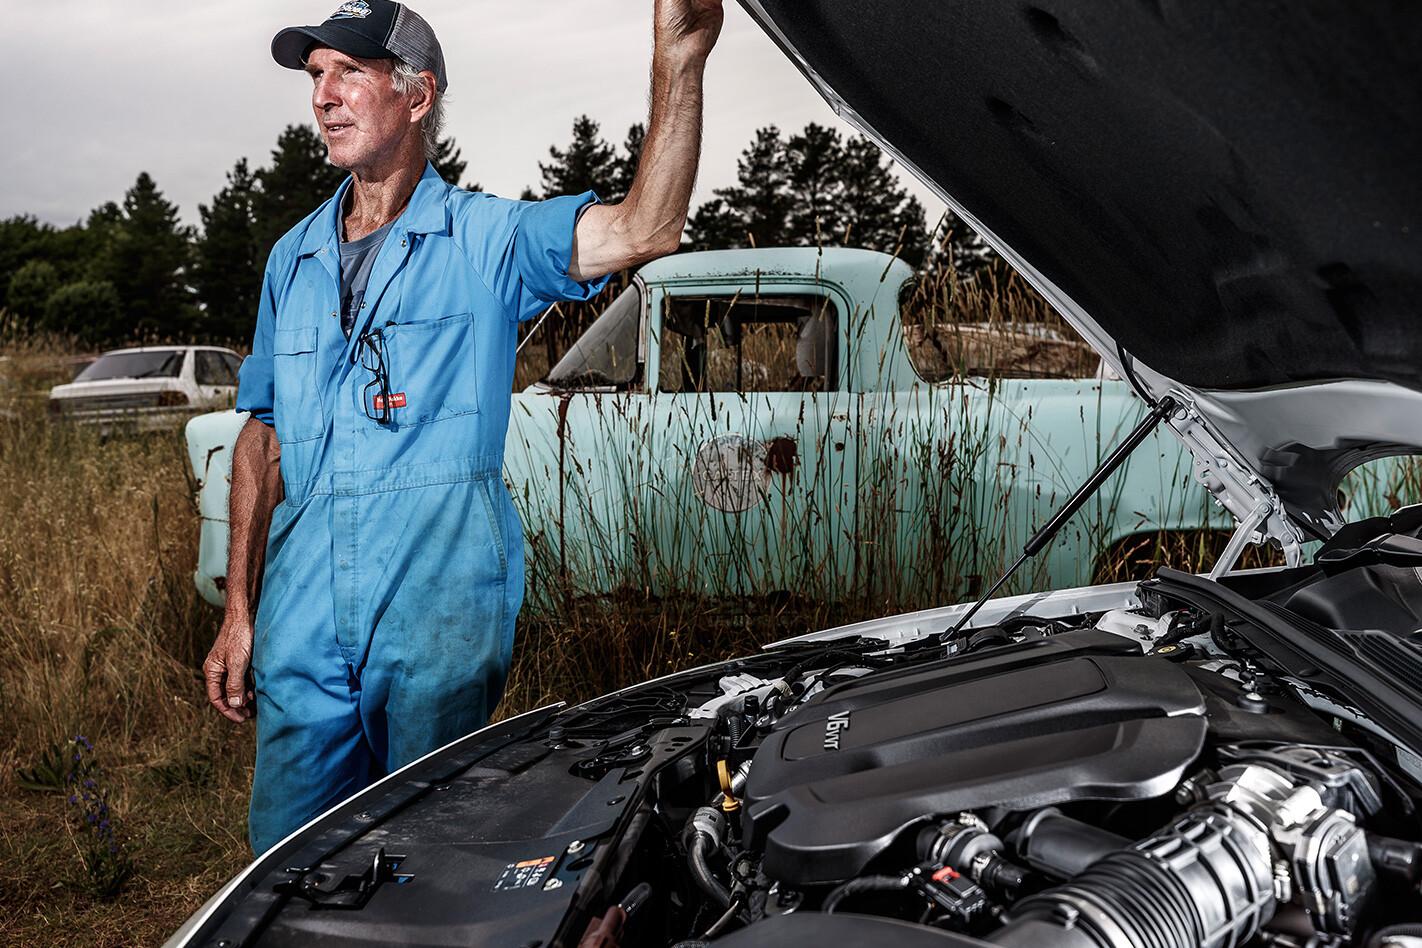 2018 Holden Commodore engine check